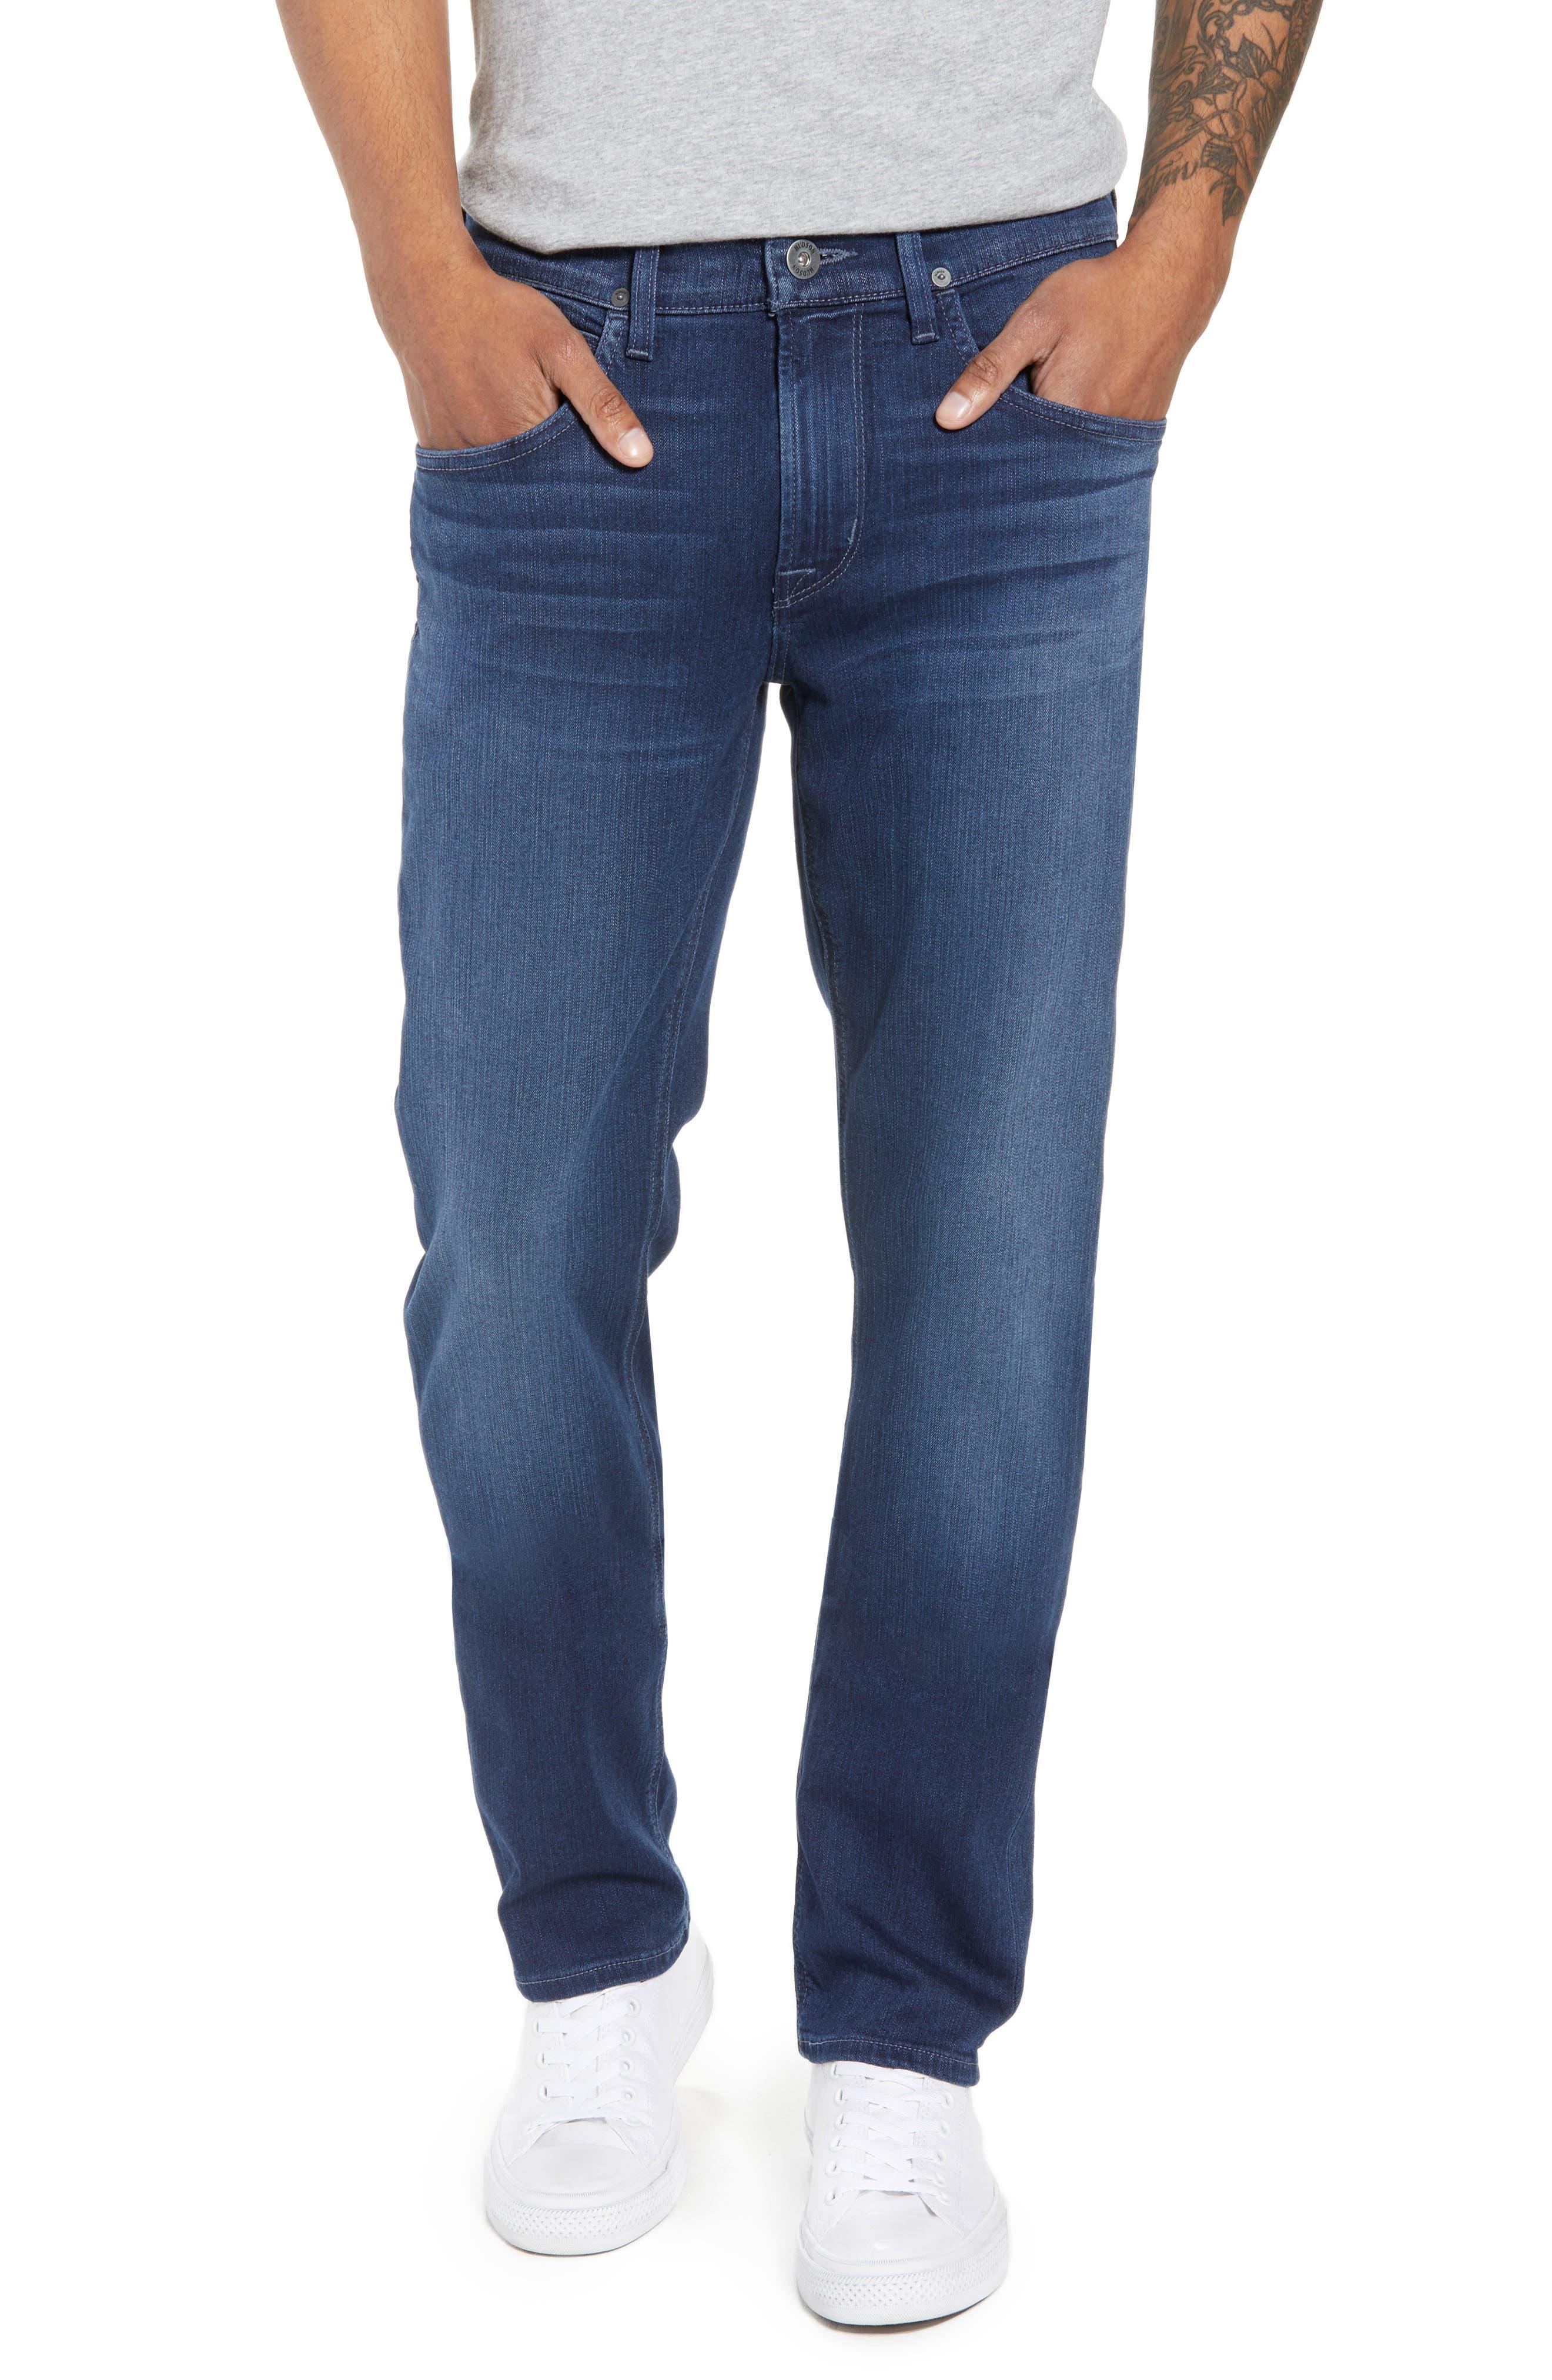 Byron Slim Straight Leg Jeans,                             Main thumbnail 1, color,                             403